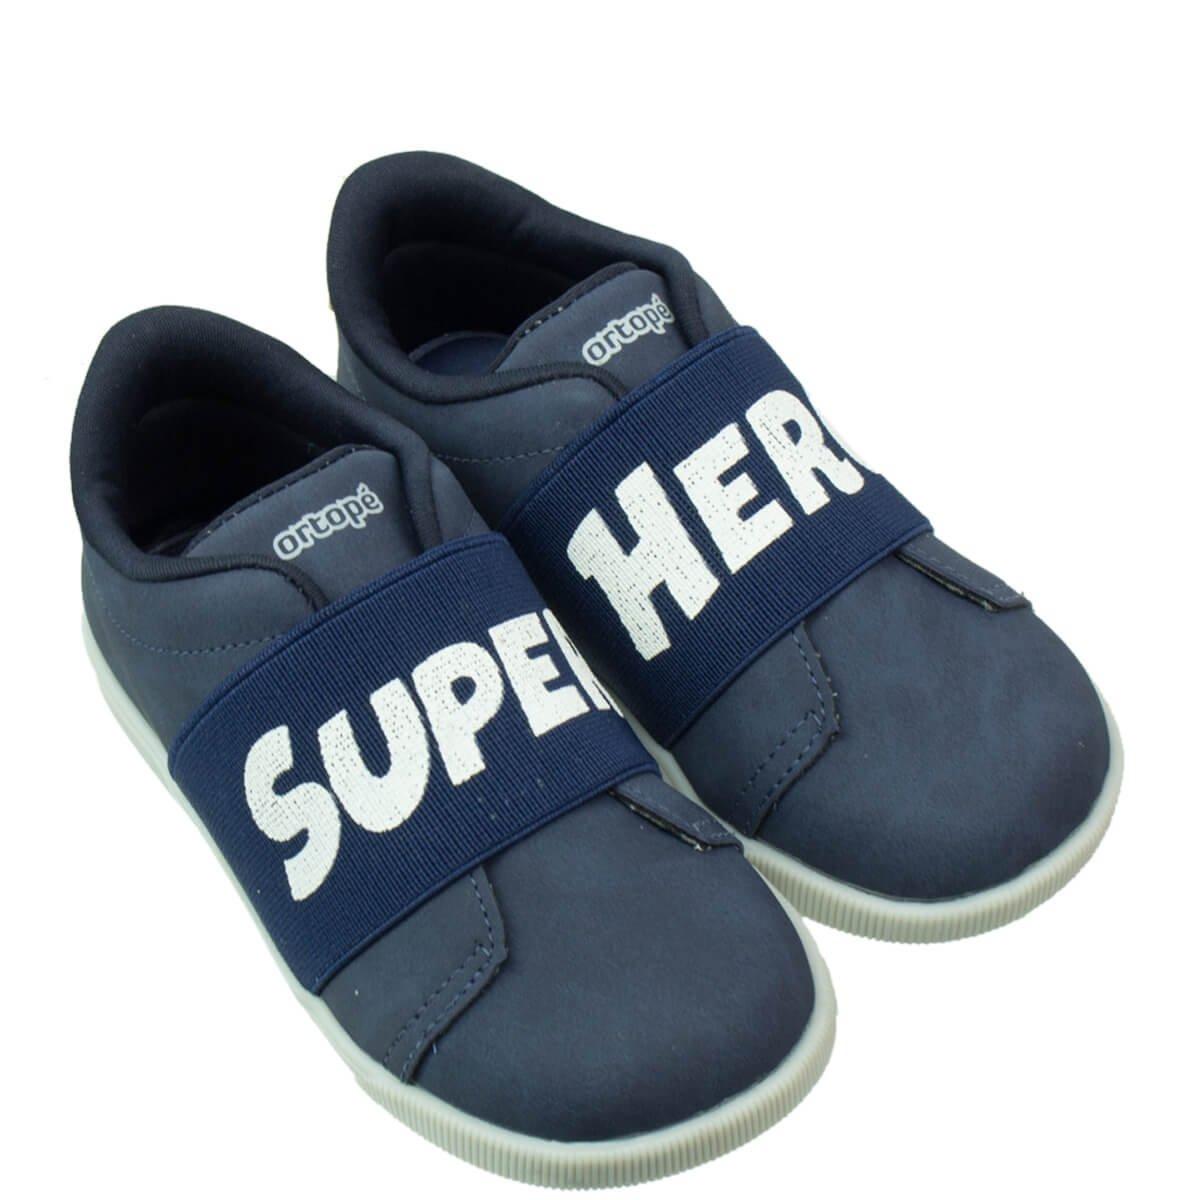 6cb931a86f8 Bizz Store - Tênis Infantil Menino Ortopé Casual Baby